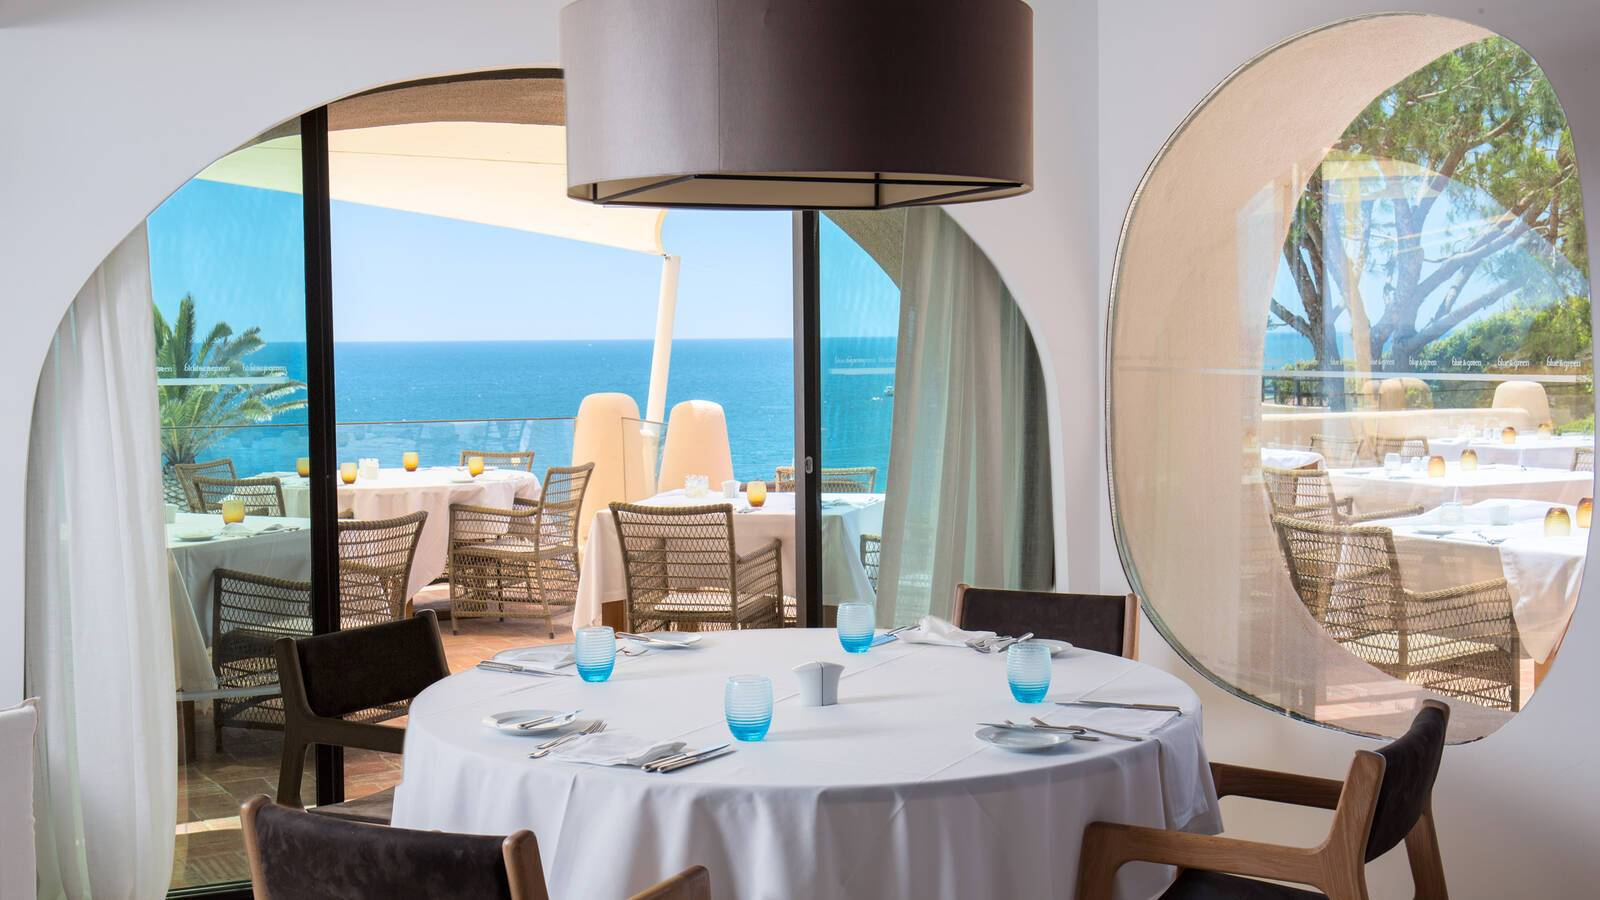 Vilalara Algrave BG Restaurant